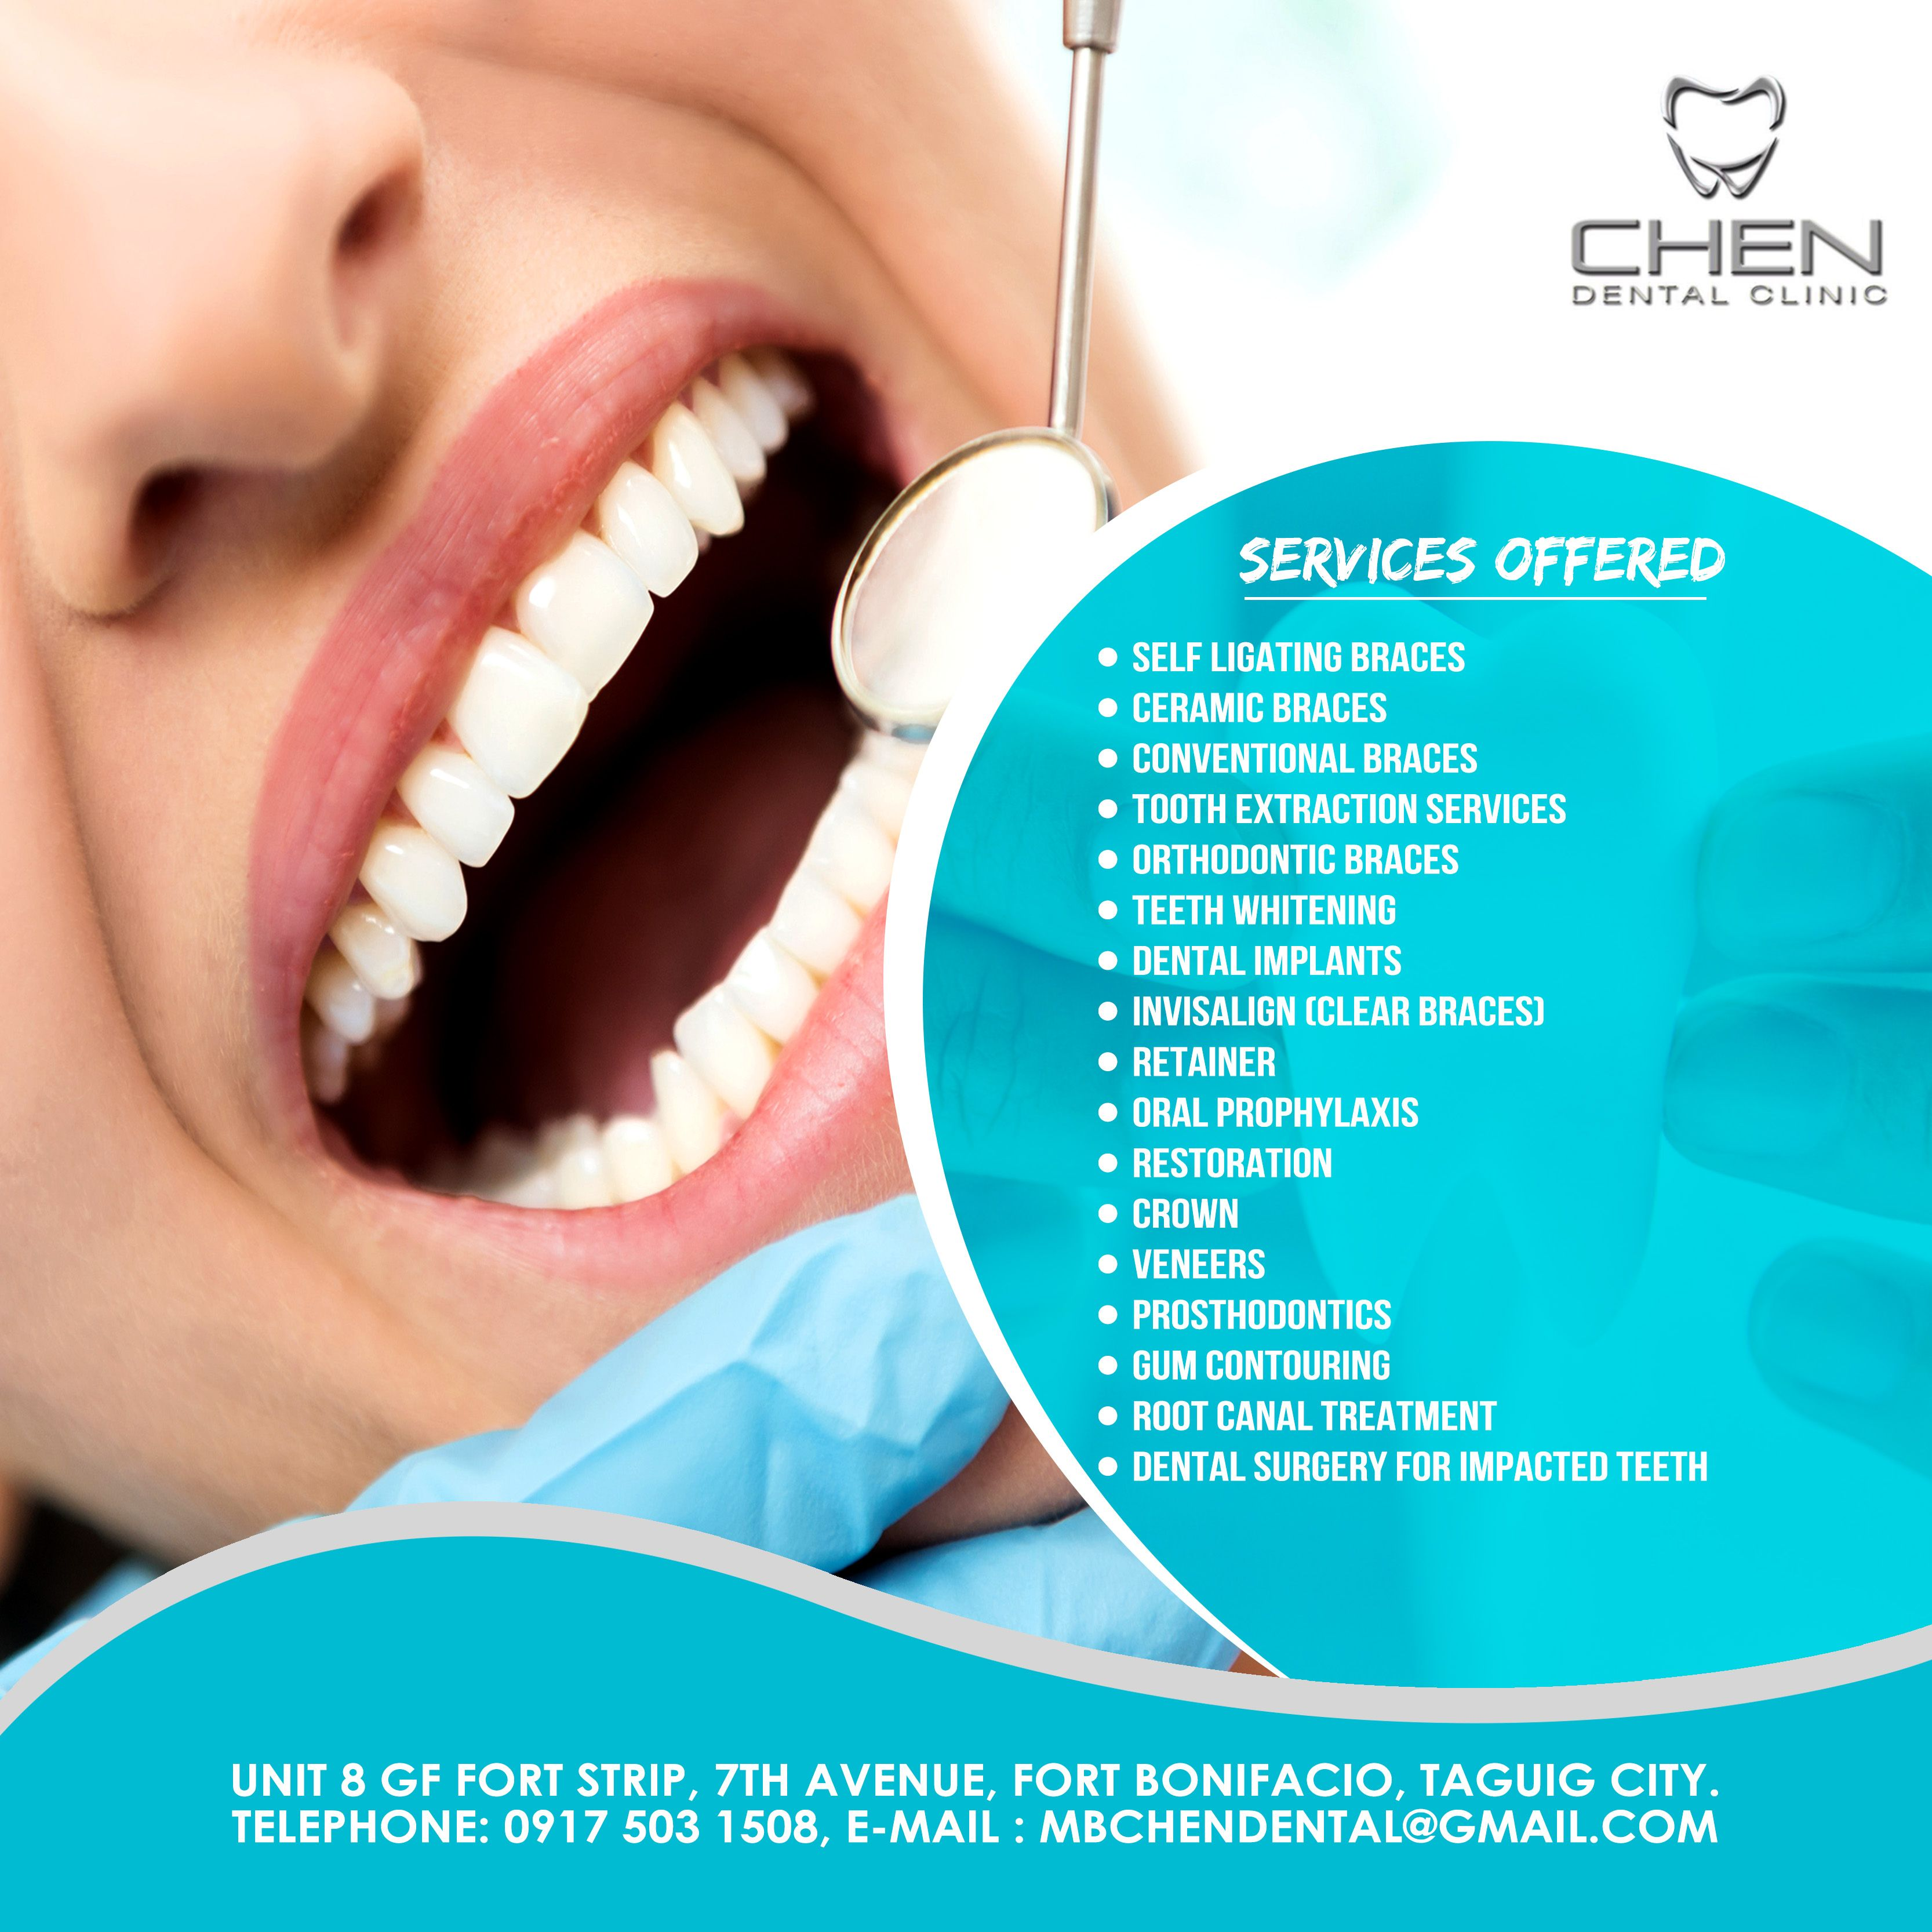 Dental Services In Bgc Taguig City Dental Clinic Dental